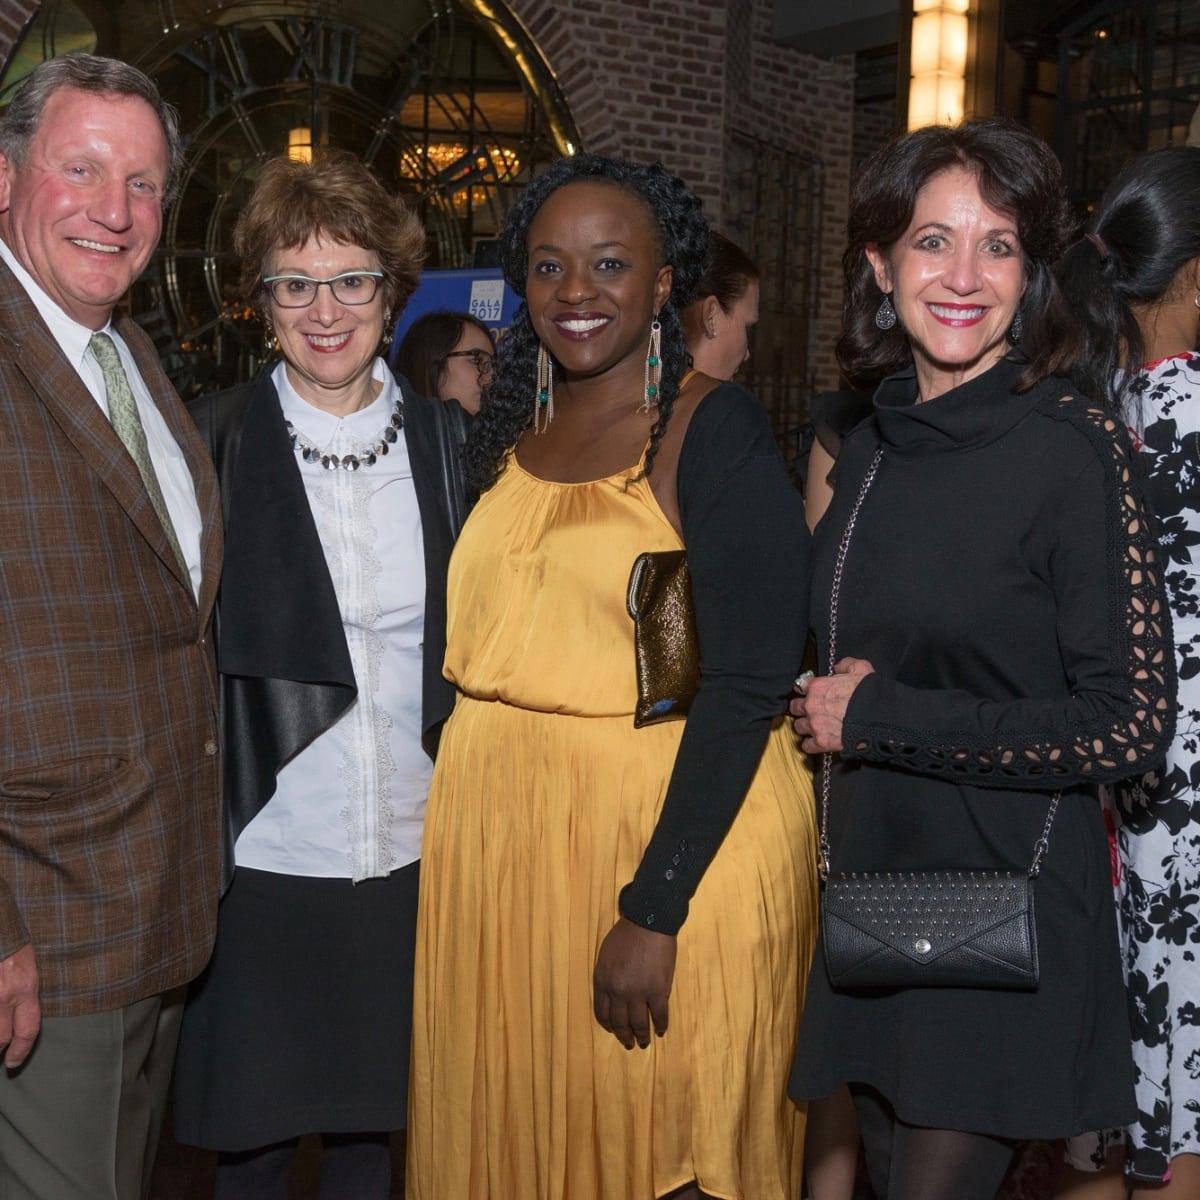 WITS gala 2017: Mike Nichols, Judith Kurnick, Carliss Chatman, Deedee Dochen